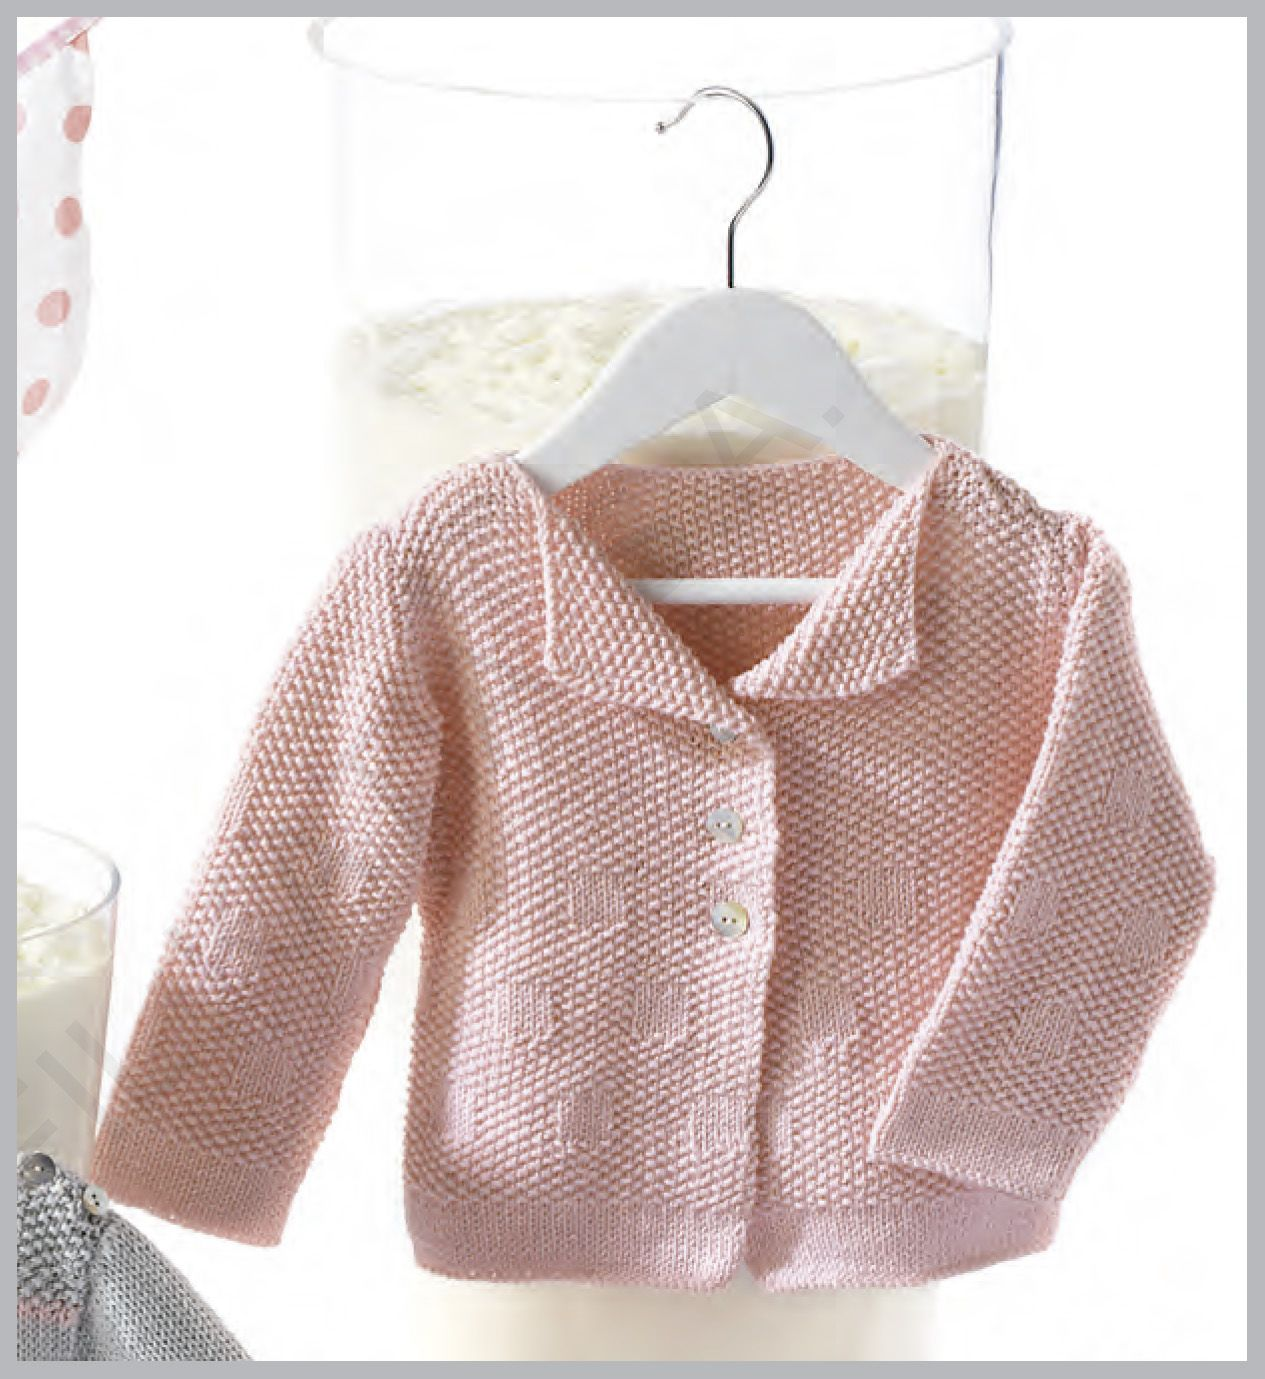 Patrón gratis de jersey para bebé de hilo a punto de arroz 3 24 meses 045a9963794